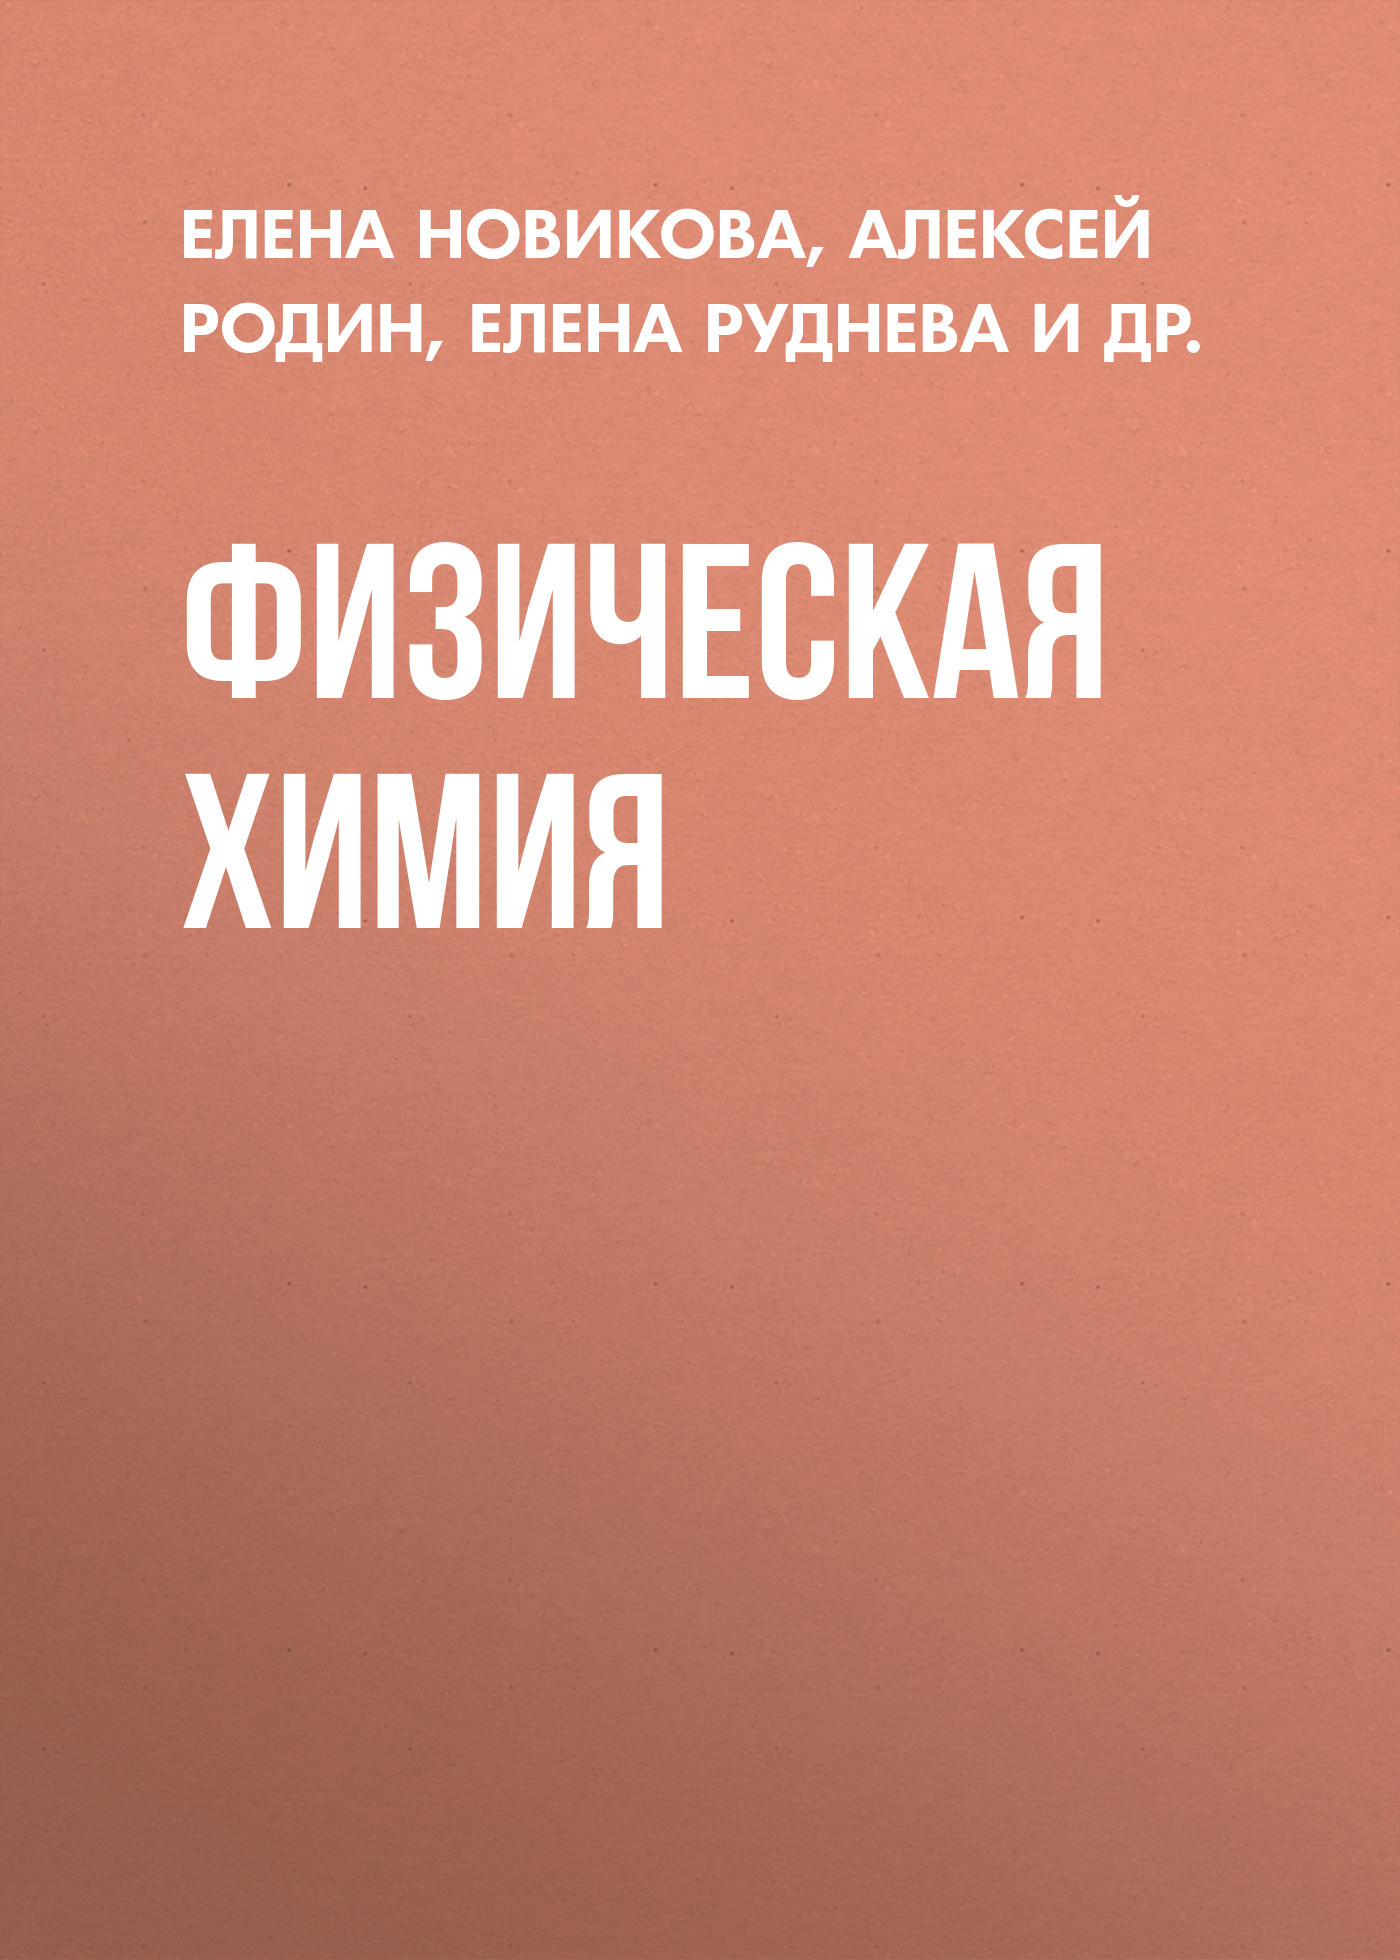 Елена Новикова. Физическая химия